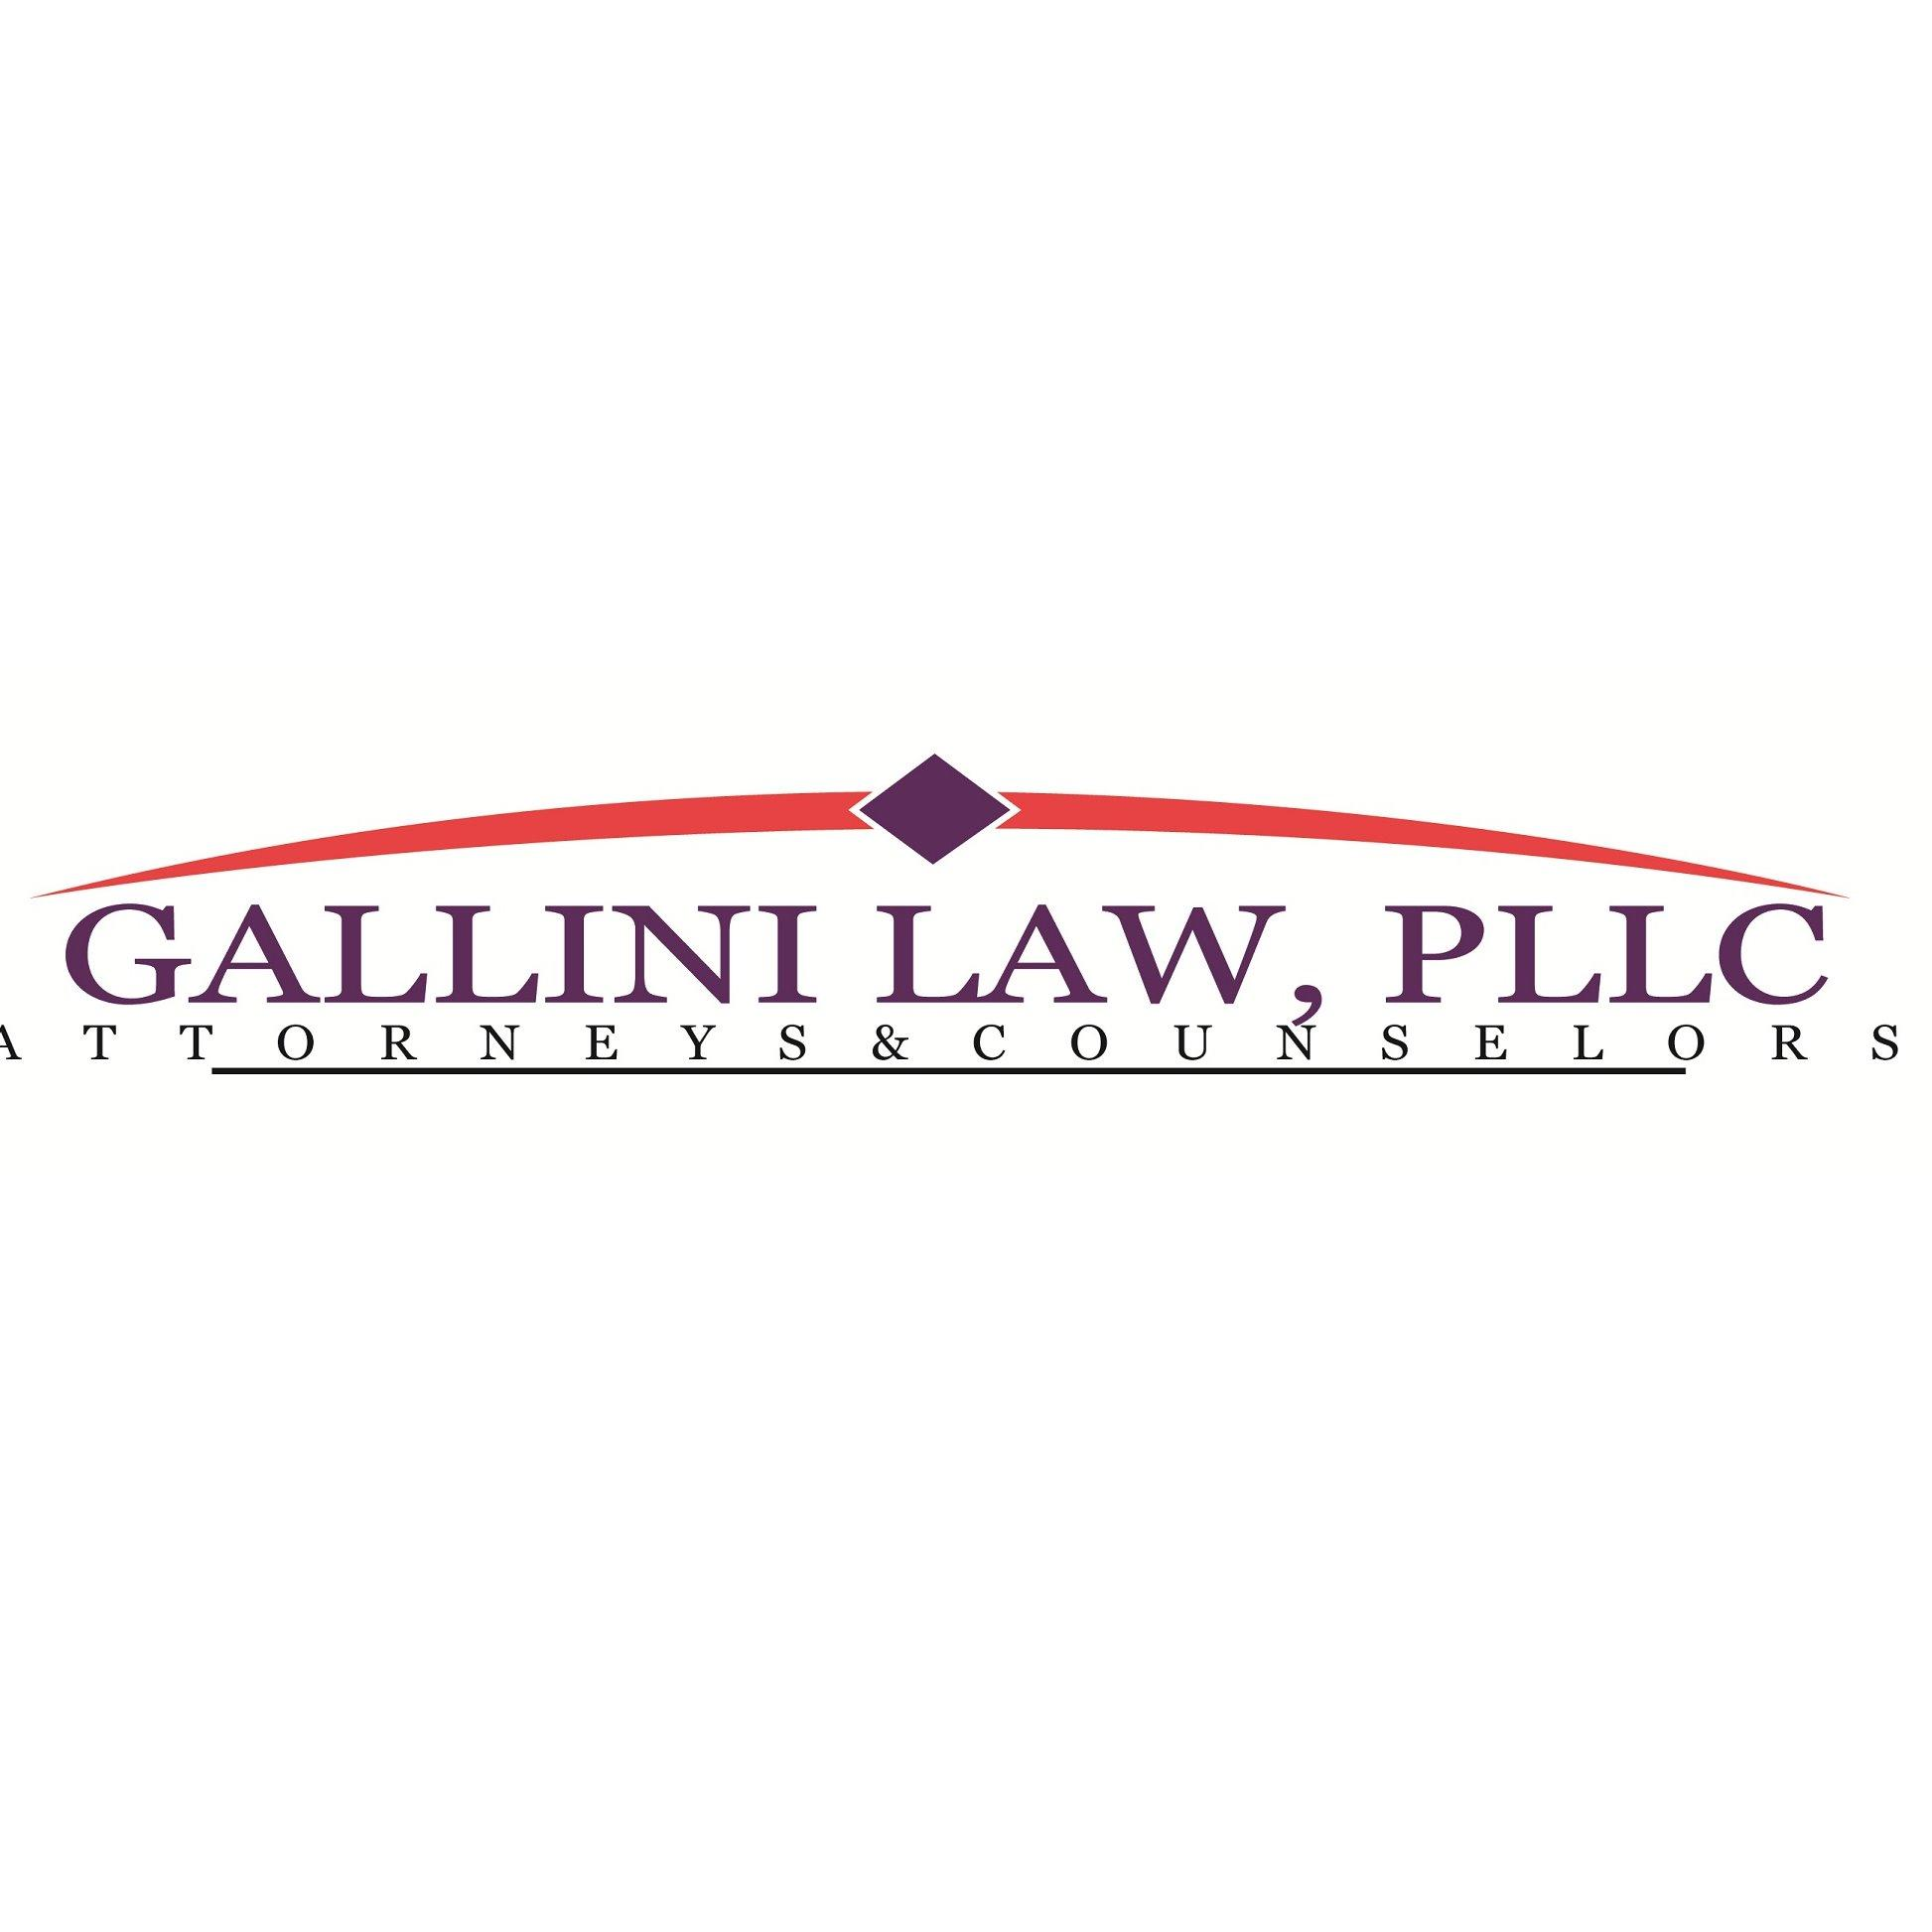 Gallini Law